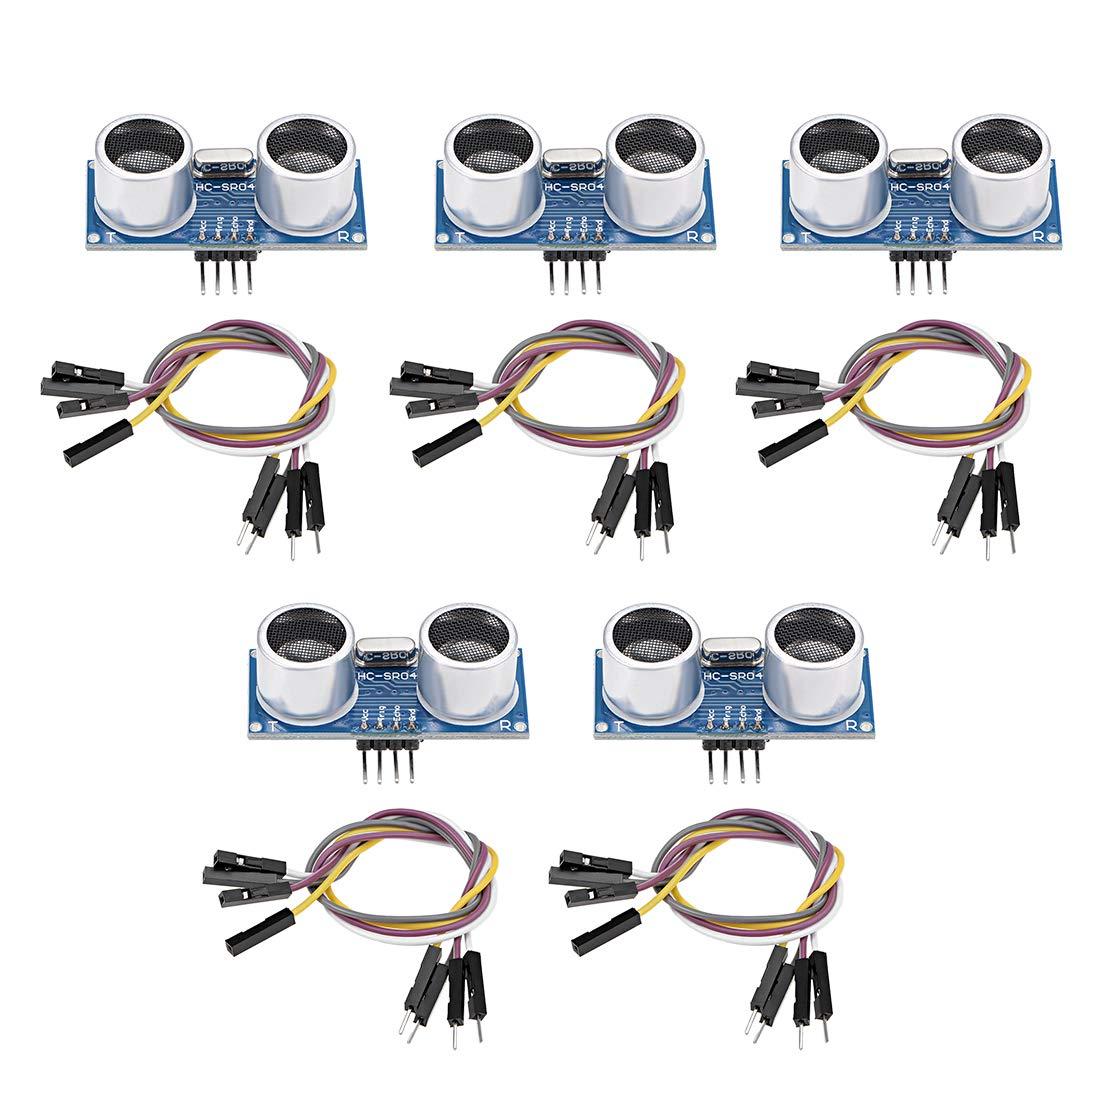 uxcell Ultrasonic Module HC-SR04 Distance Sensor with Jumper Wire for Arduino UNO MEGA R3 Mega2560 Duemilanove Nano Robot 5Set